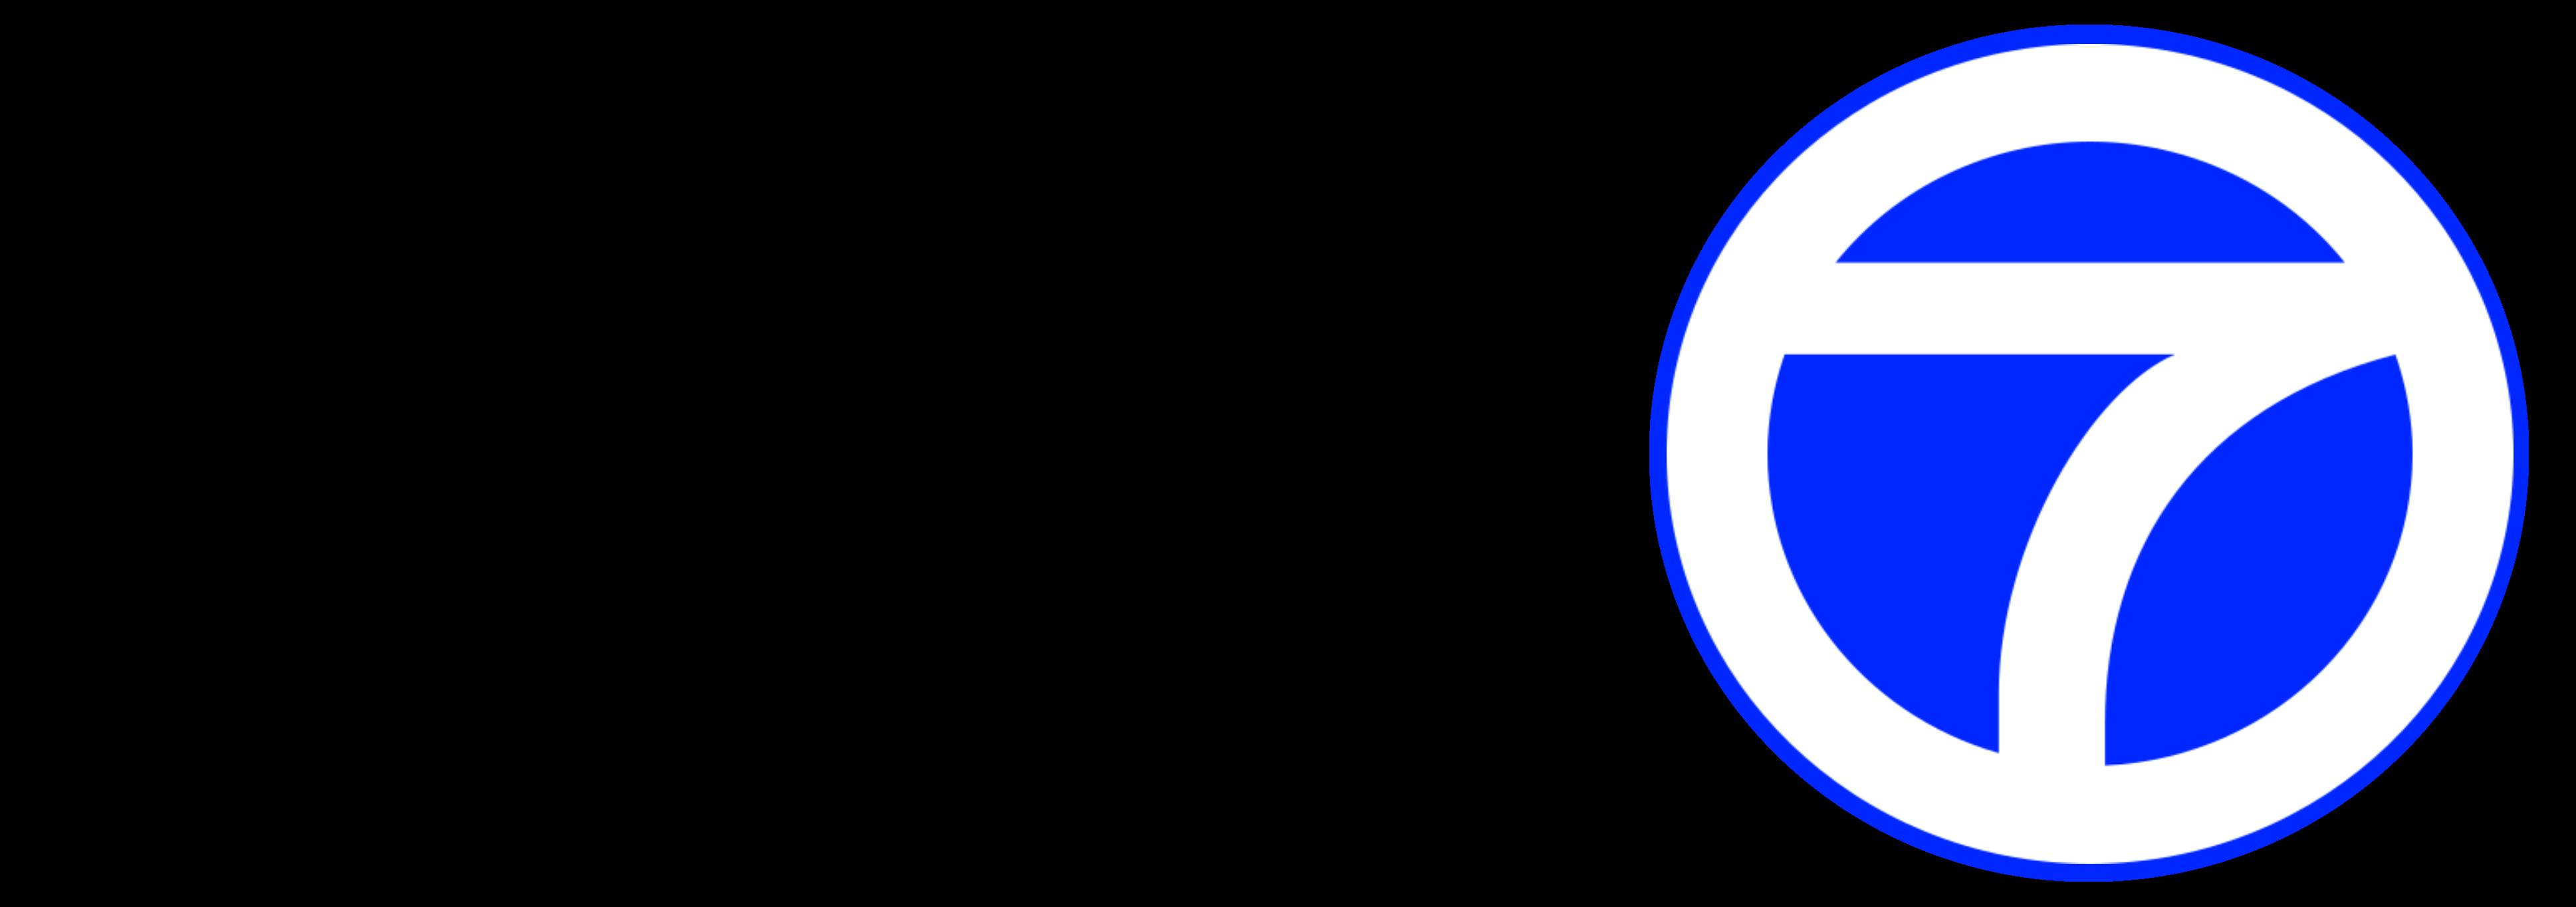 AlternateHistory.com's WABC logo #1.png